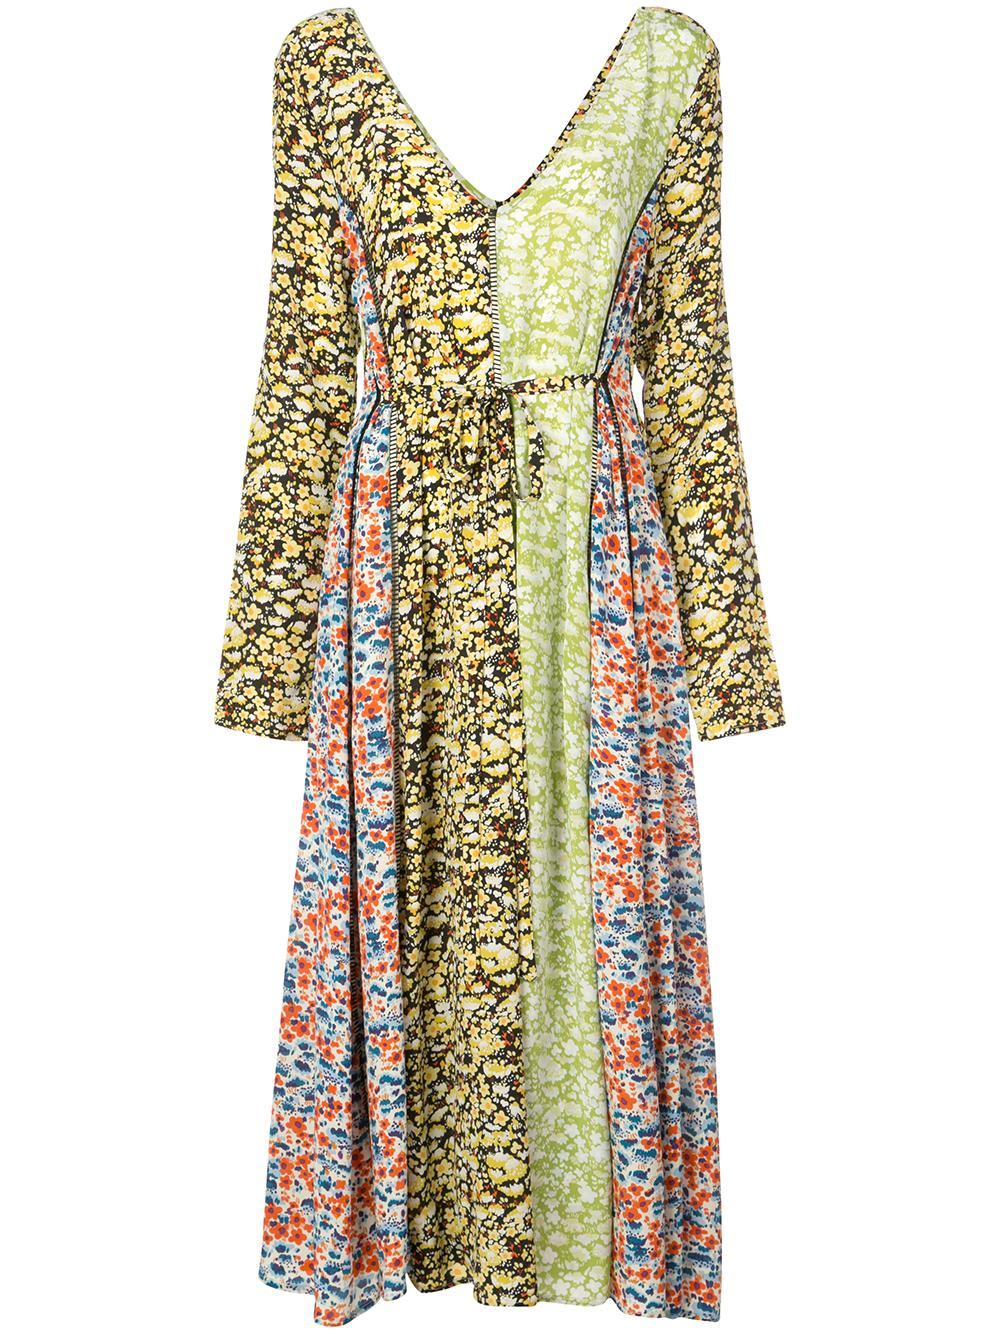 Mica Meadow Silk Scoop Neck Maxi Dress Item # SG2610